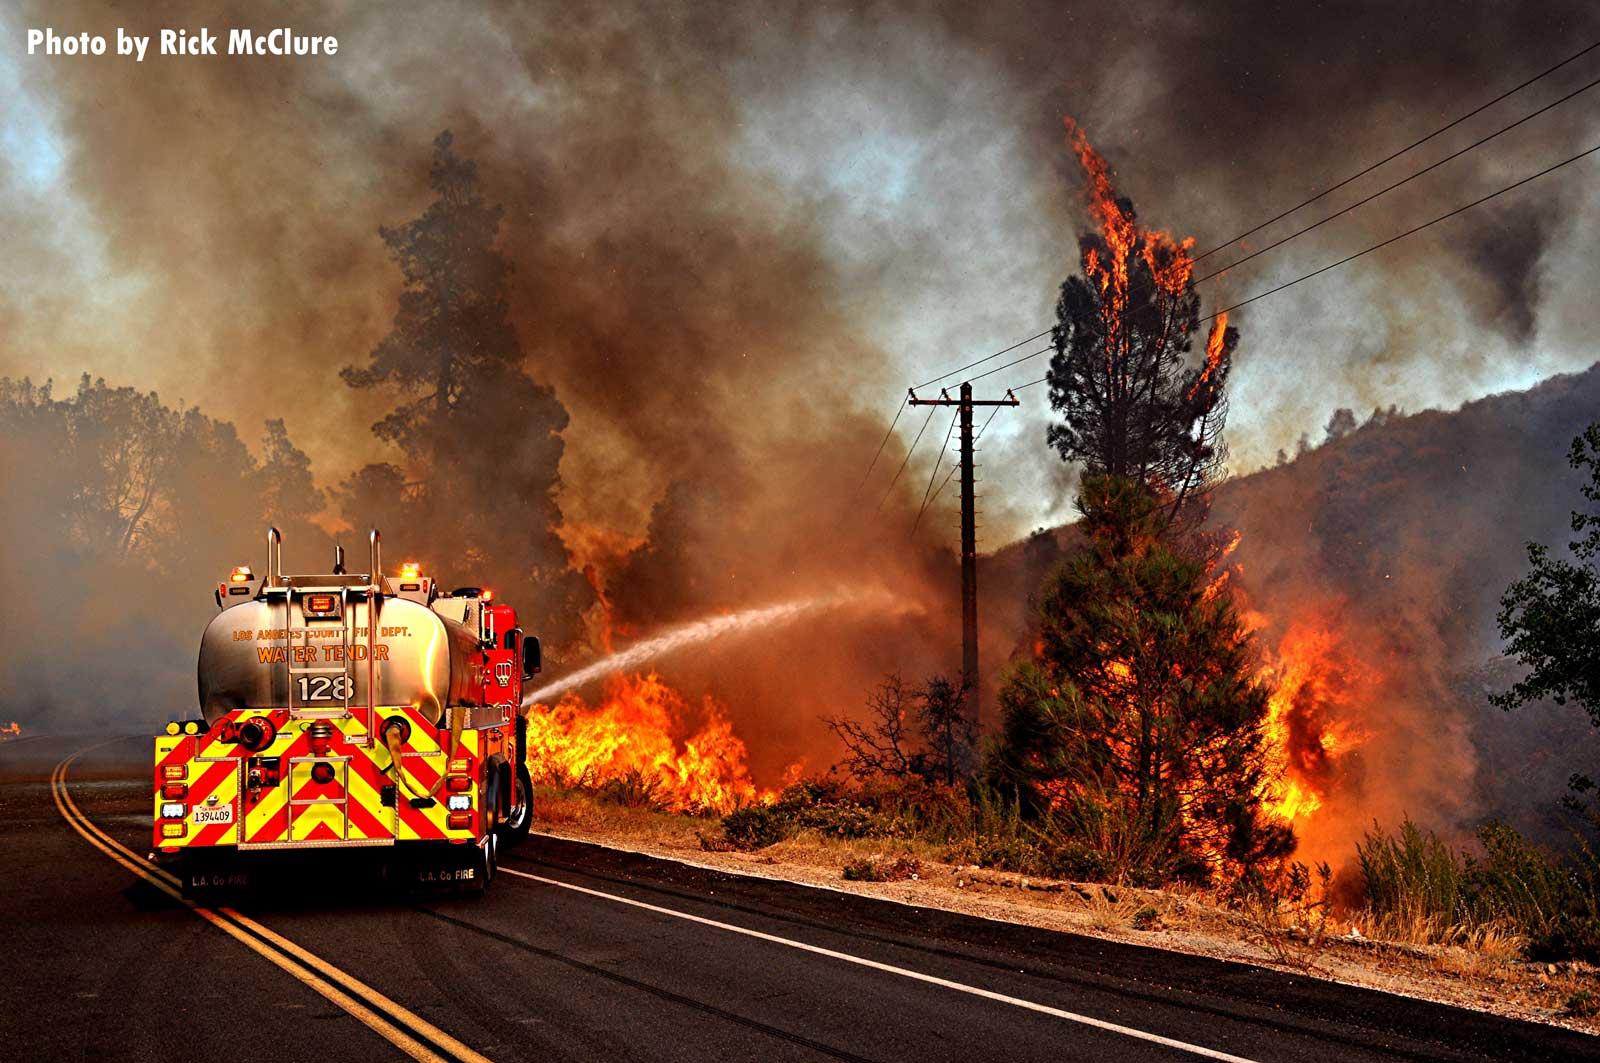 Fire apparatus battling wildfire